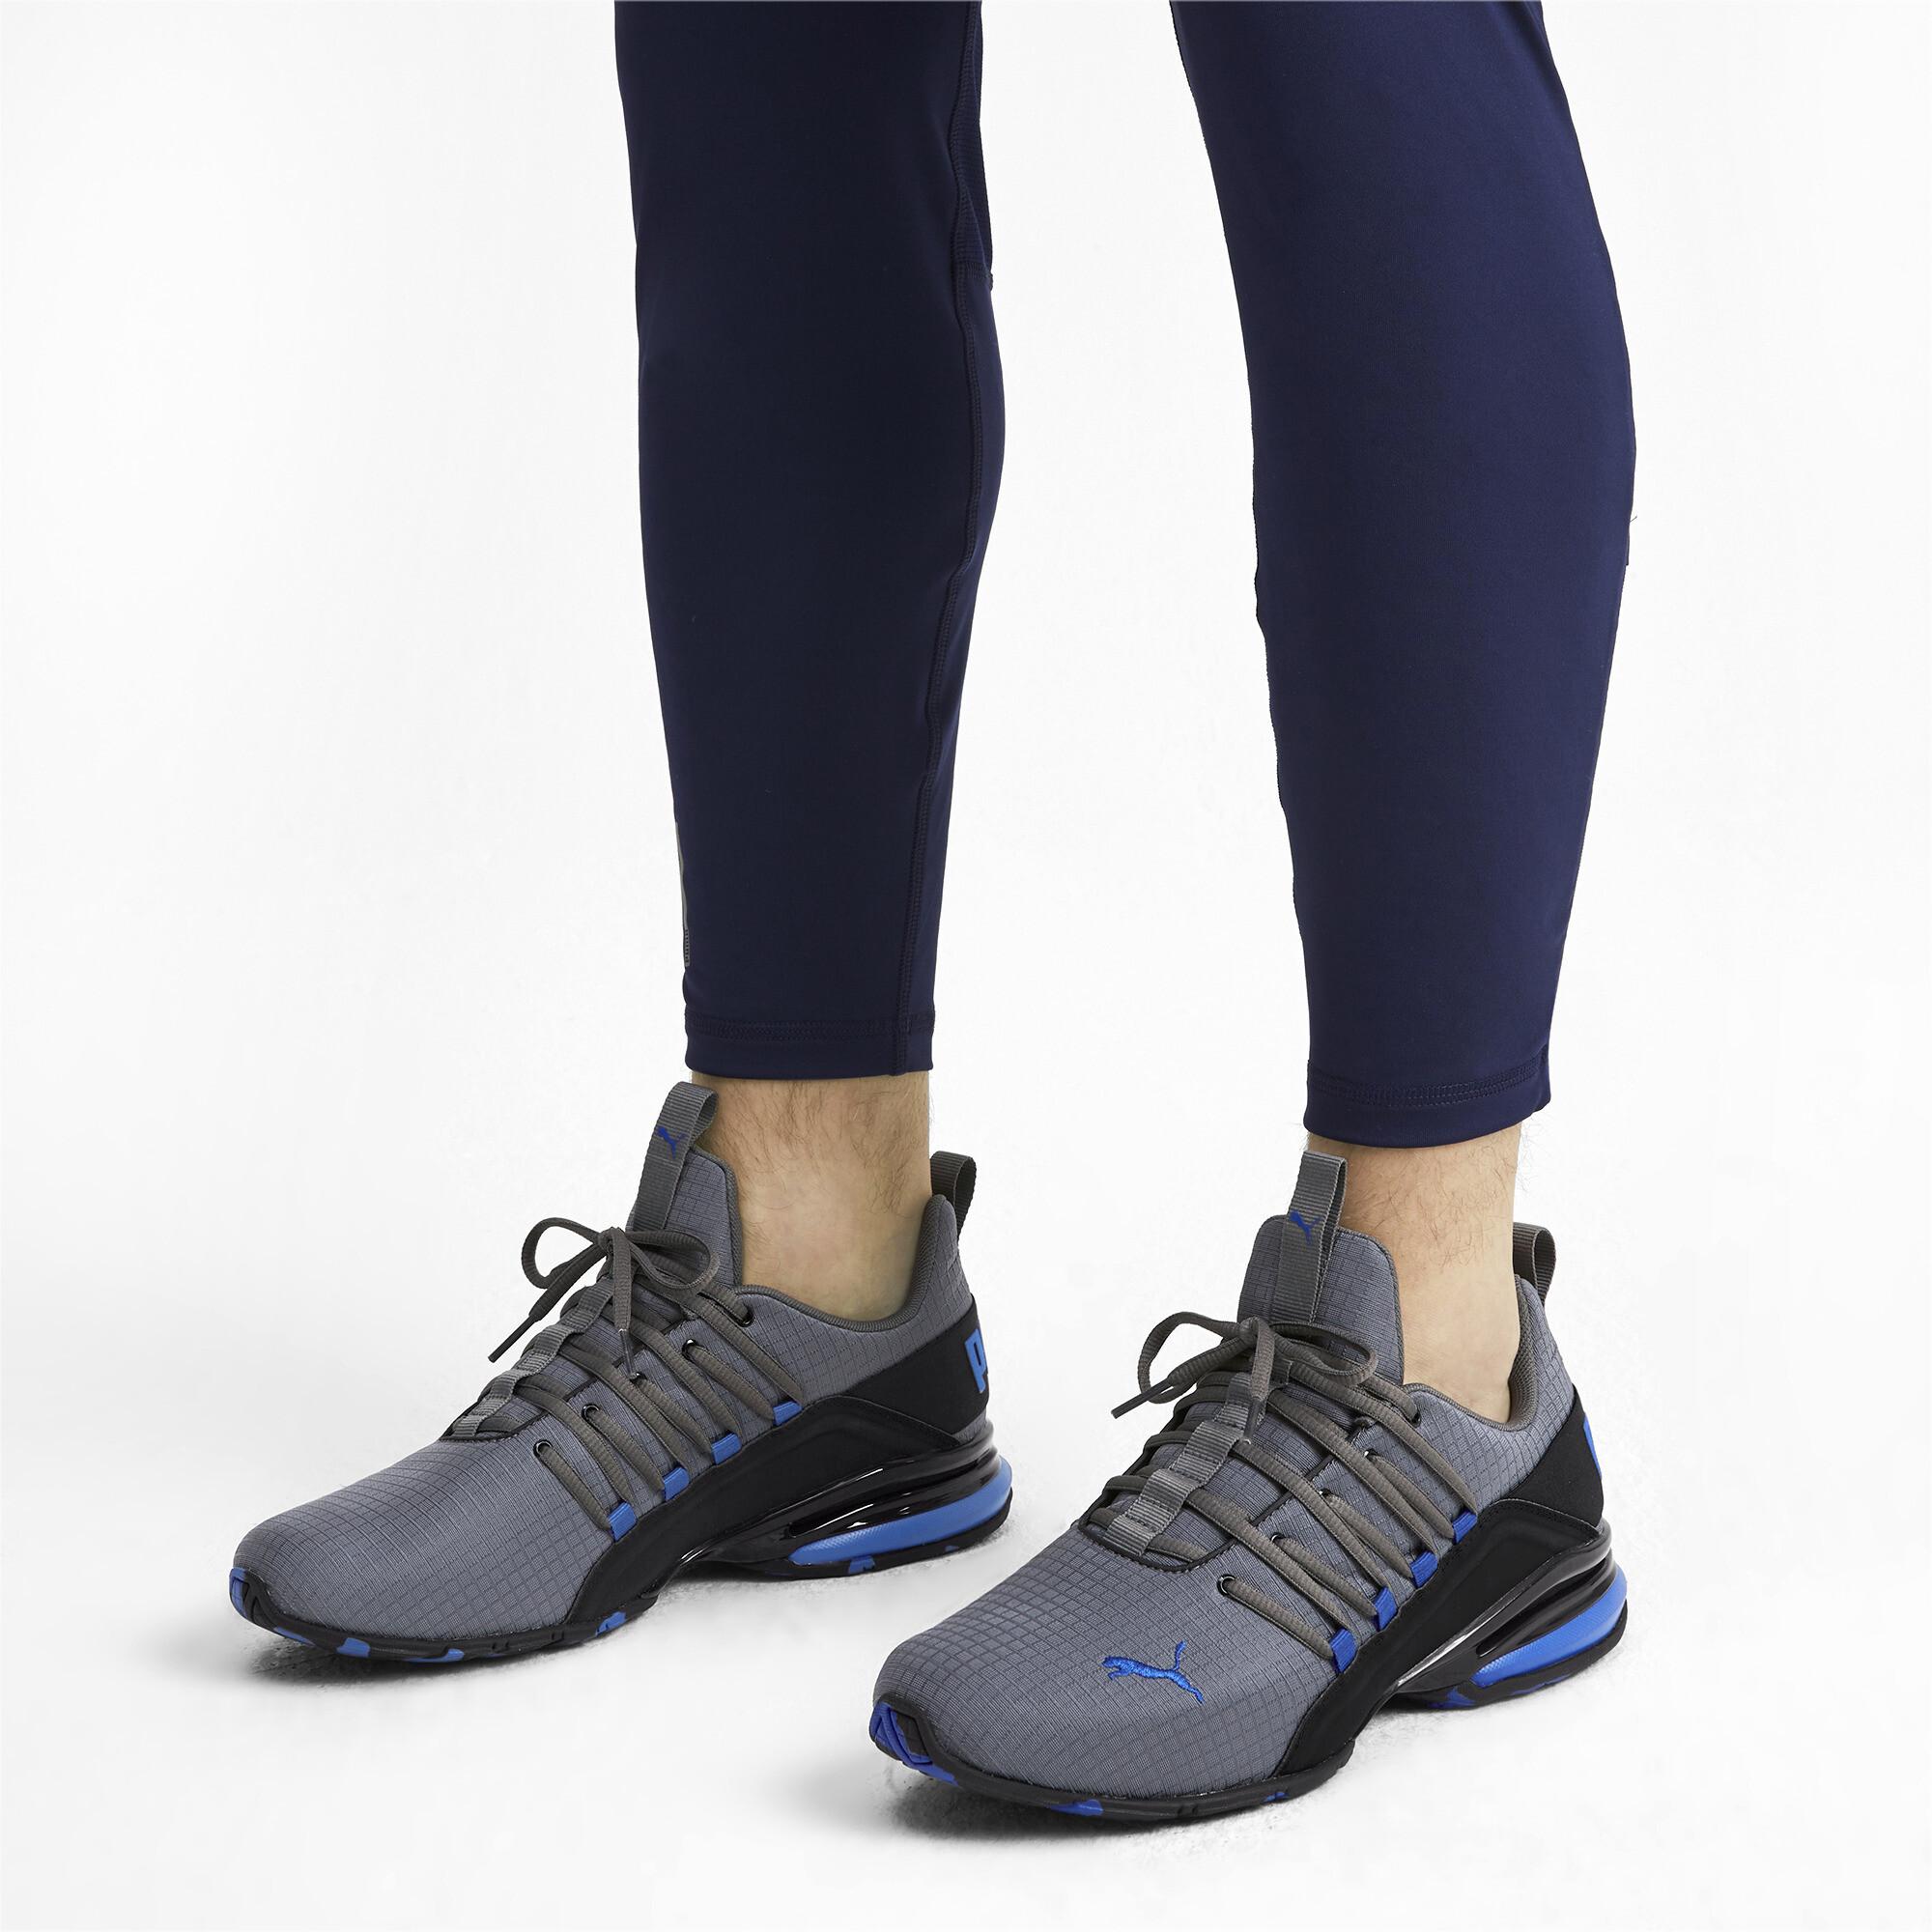 PUMA-Men-039-s-Axelion-Rip-Training-Shoes thumbnail 19